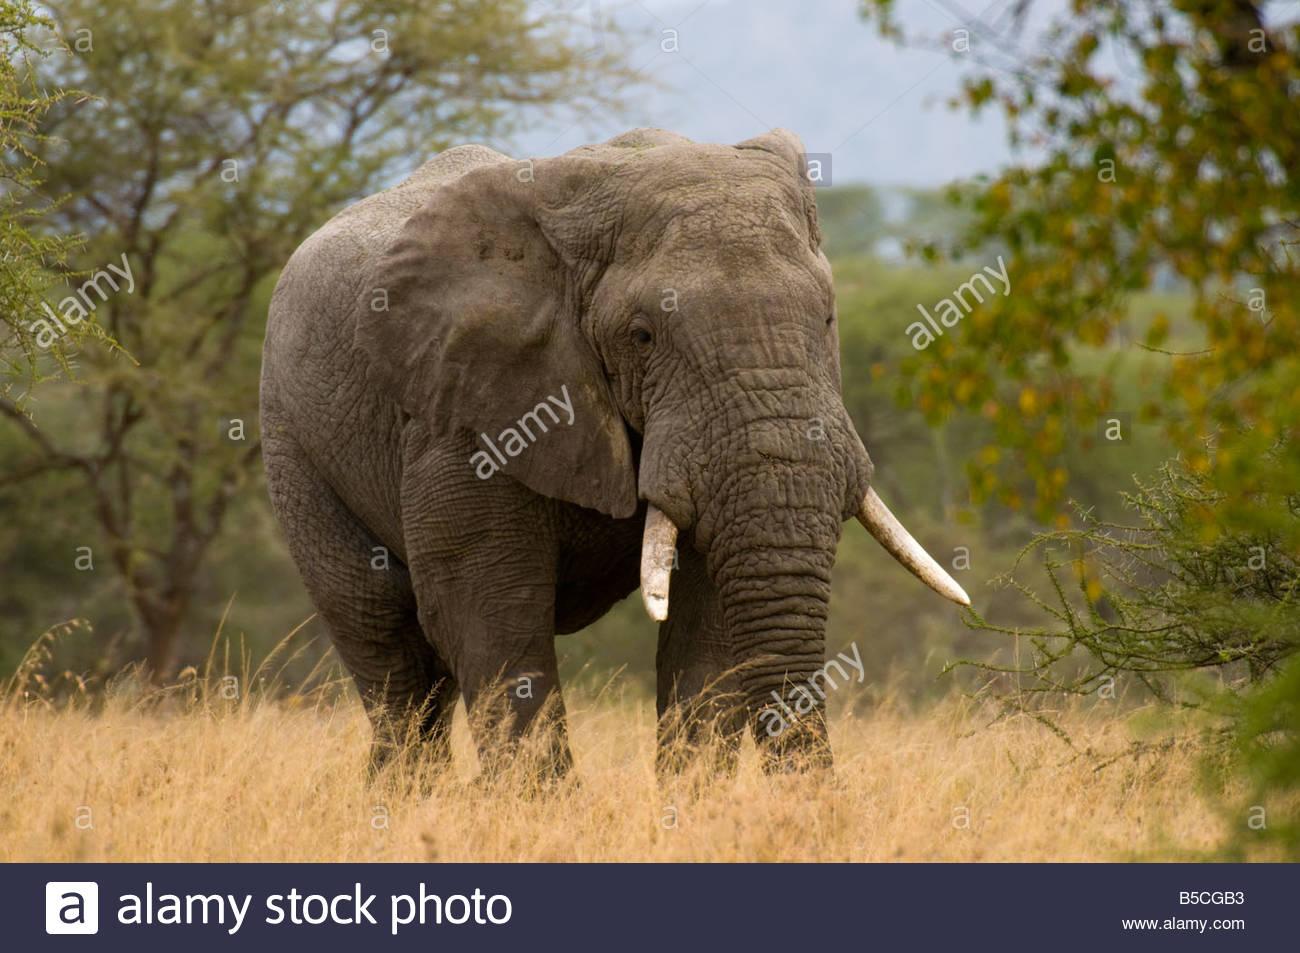 African Bull Elephant Serengeti National Park Tanzania - Stock Image